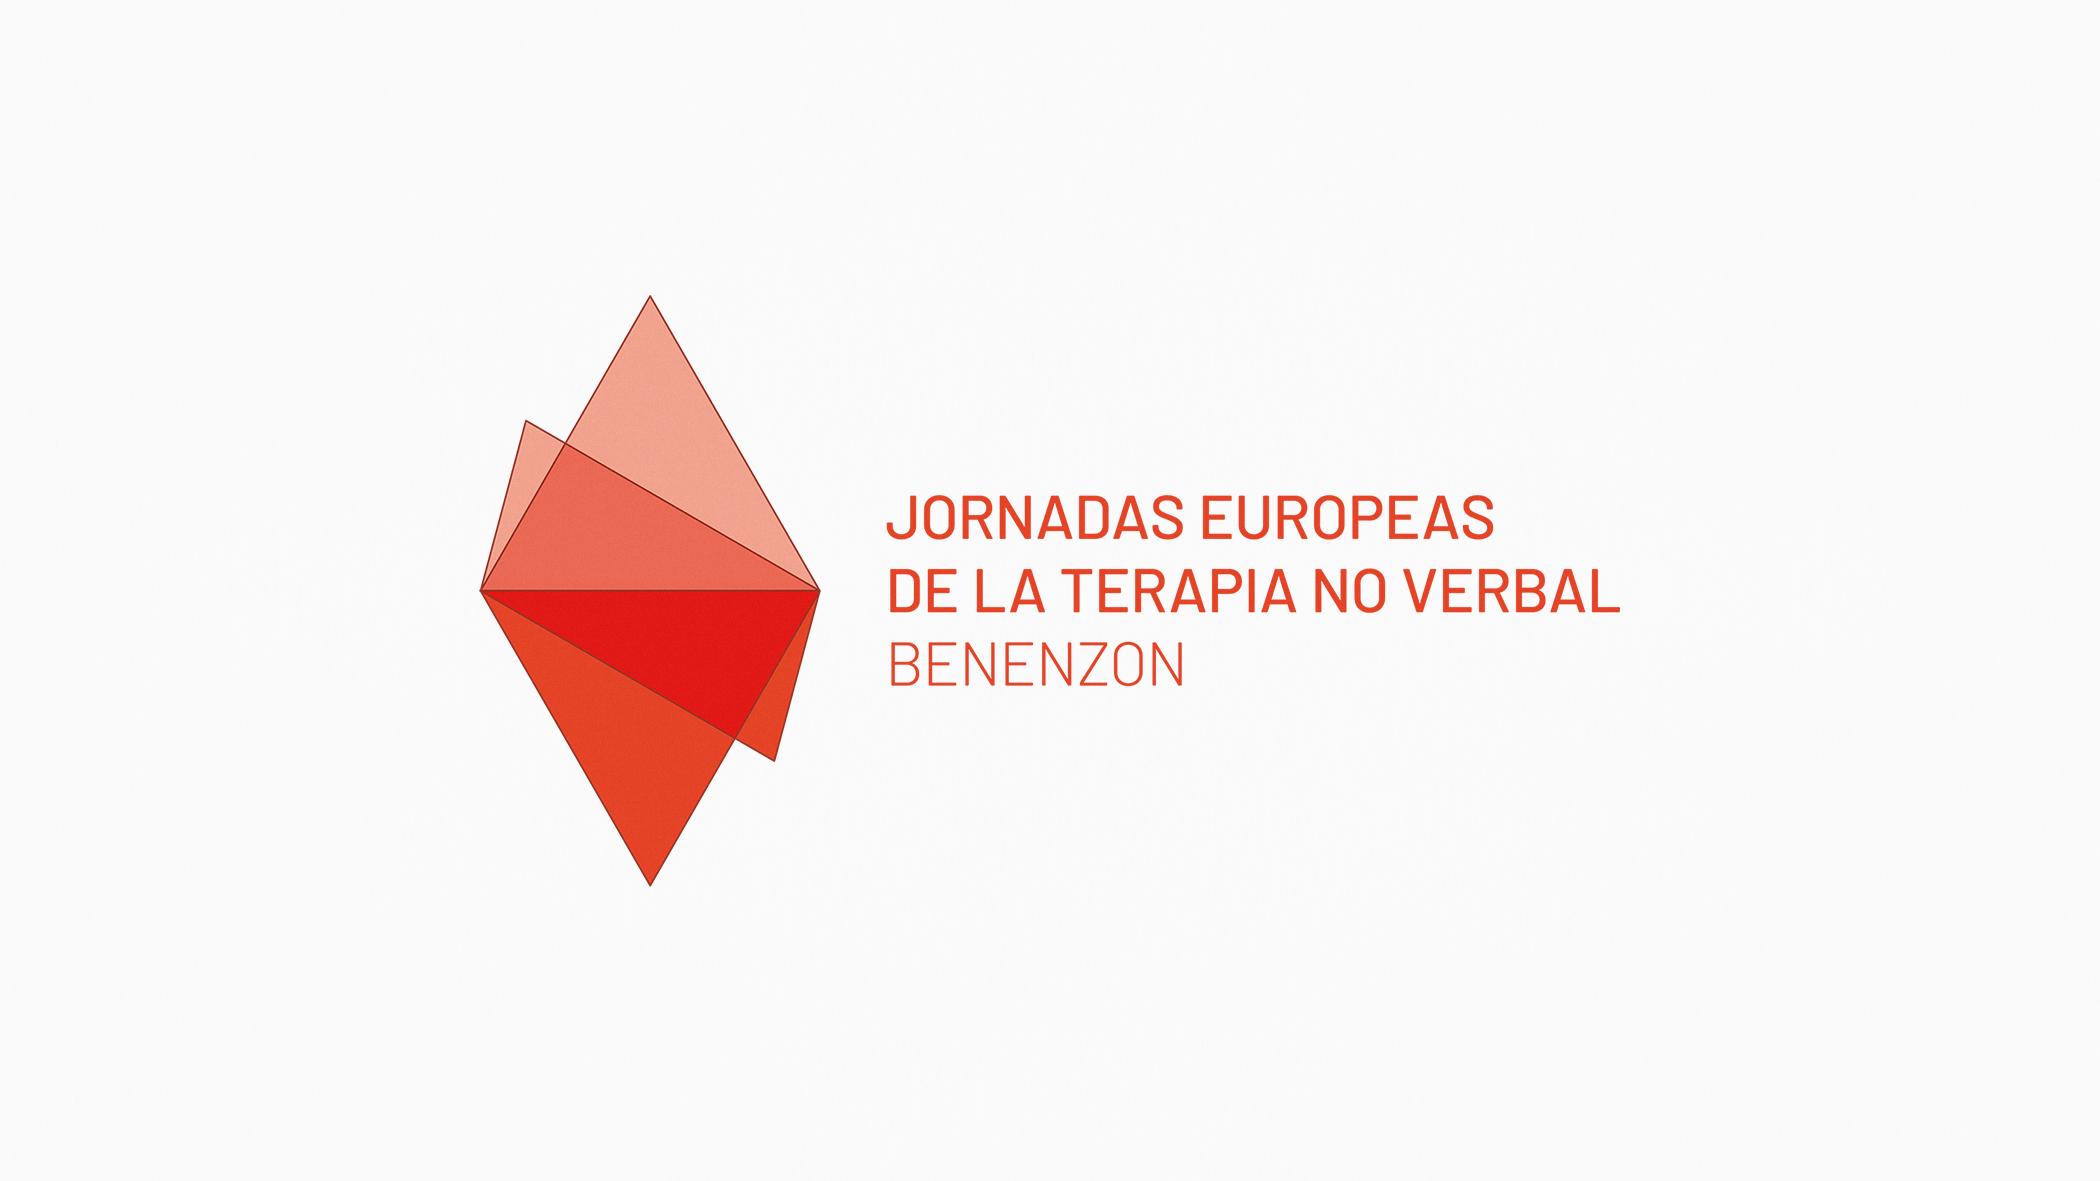 Jornadas Europeas Benenzon 07.jpg